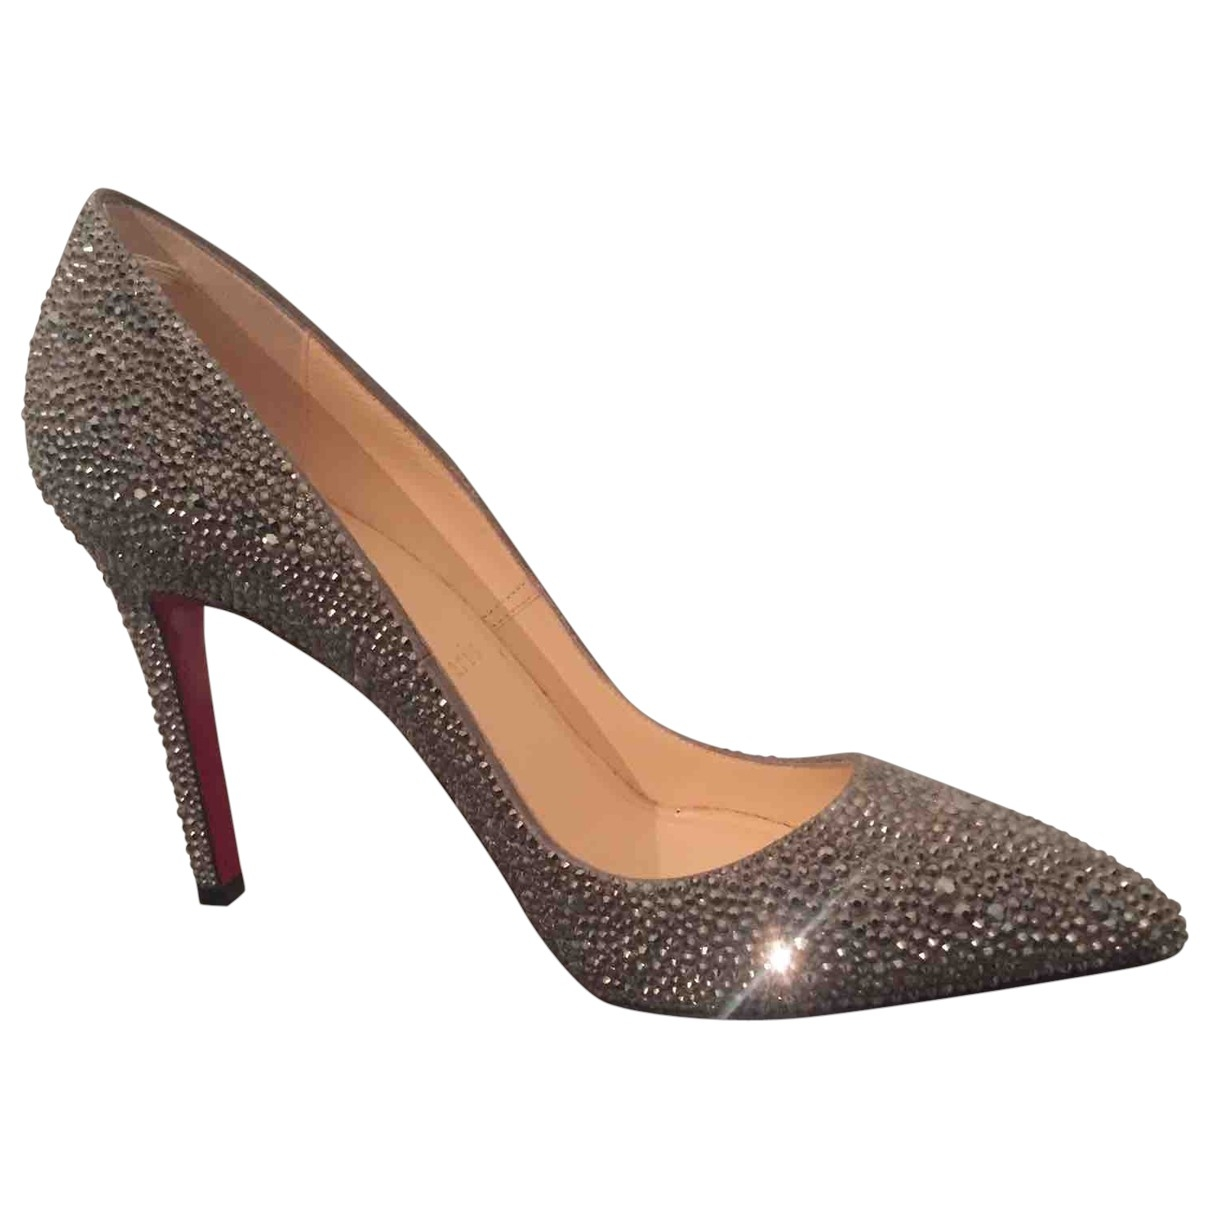 Christian Louboutin \N Silver Leather Heels for Women 38.5 EU